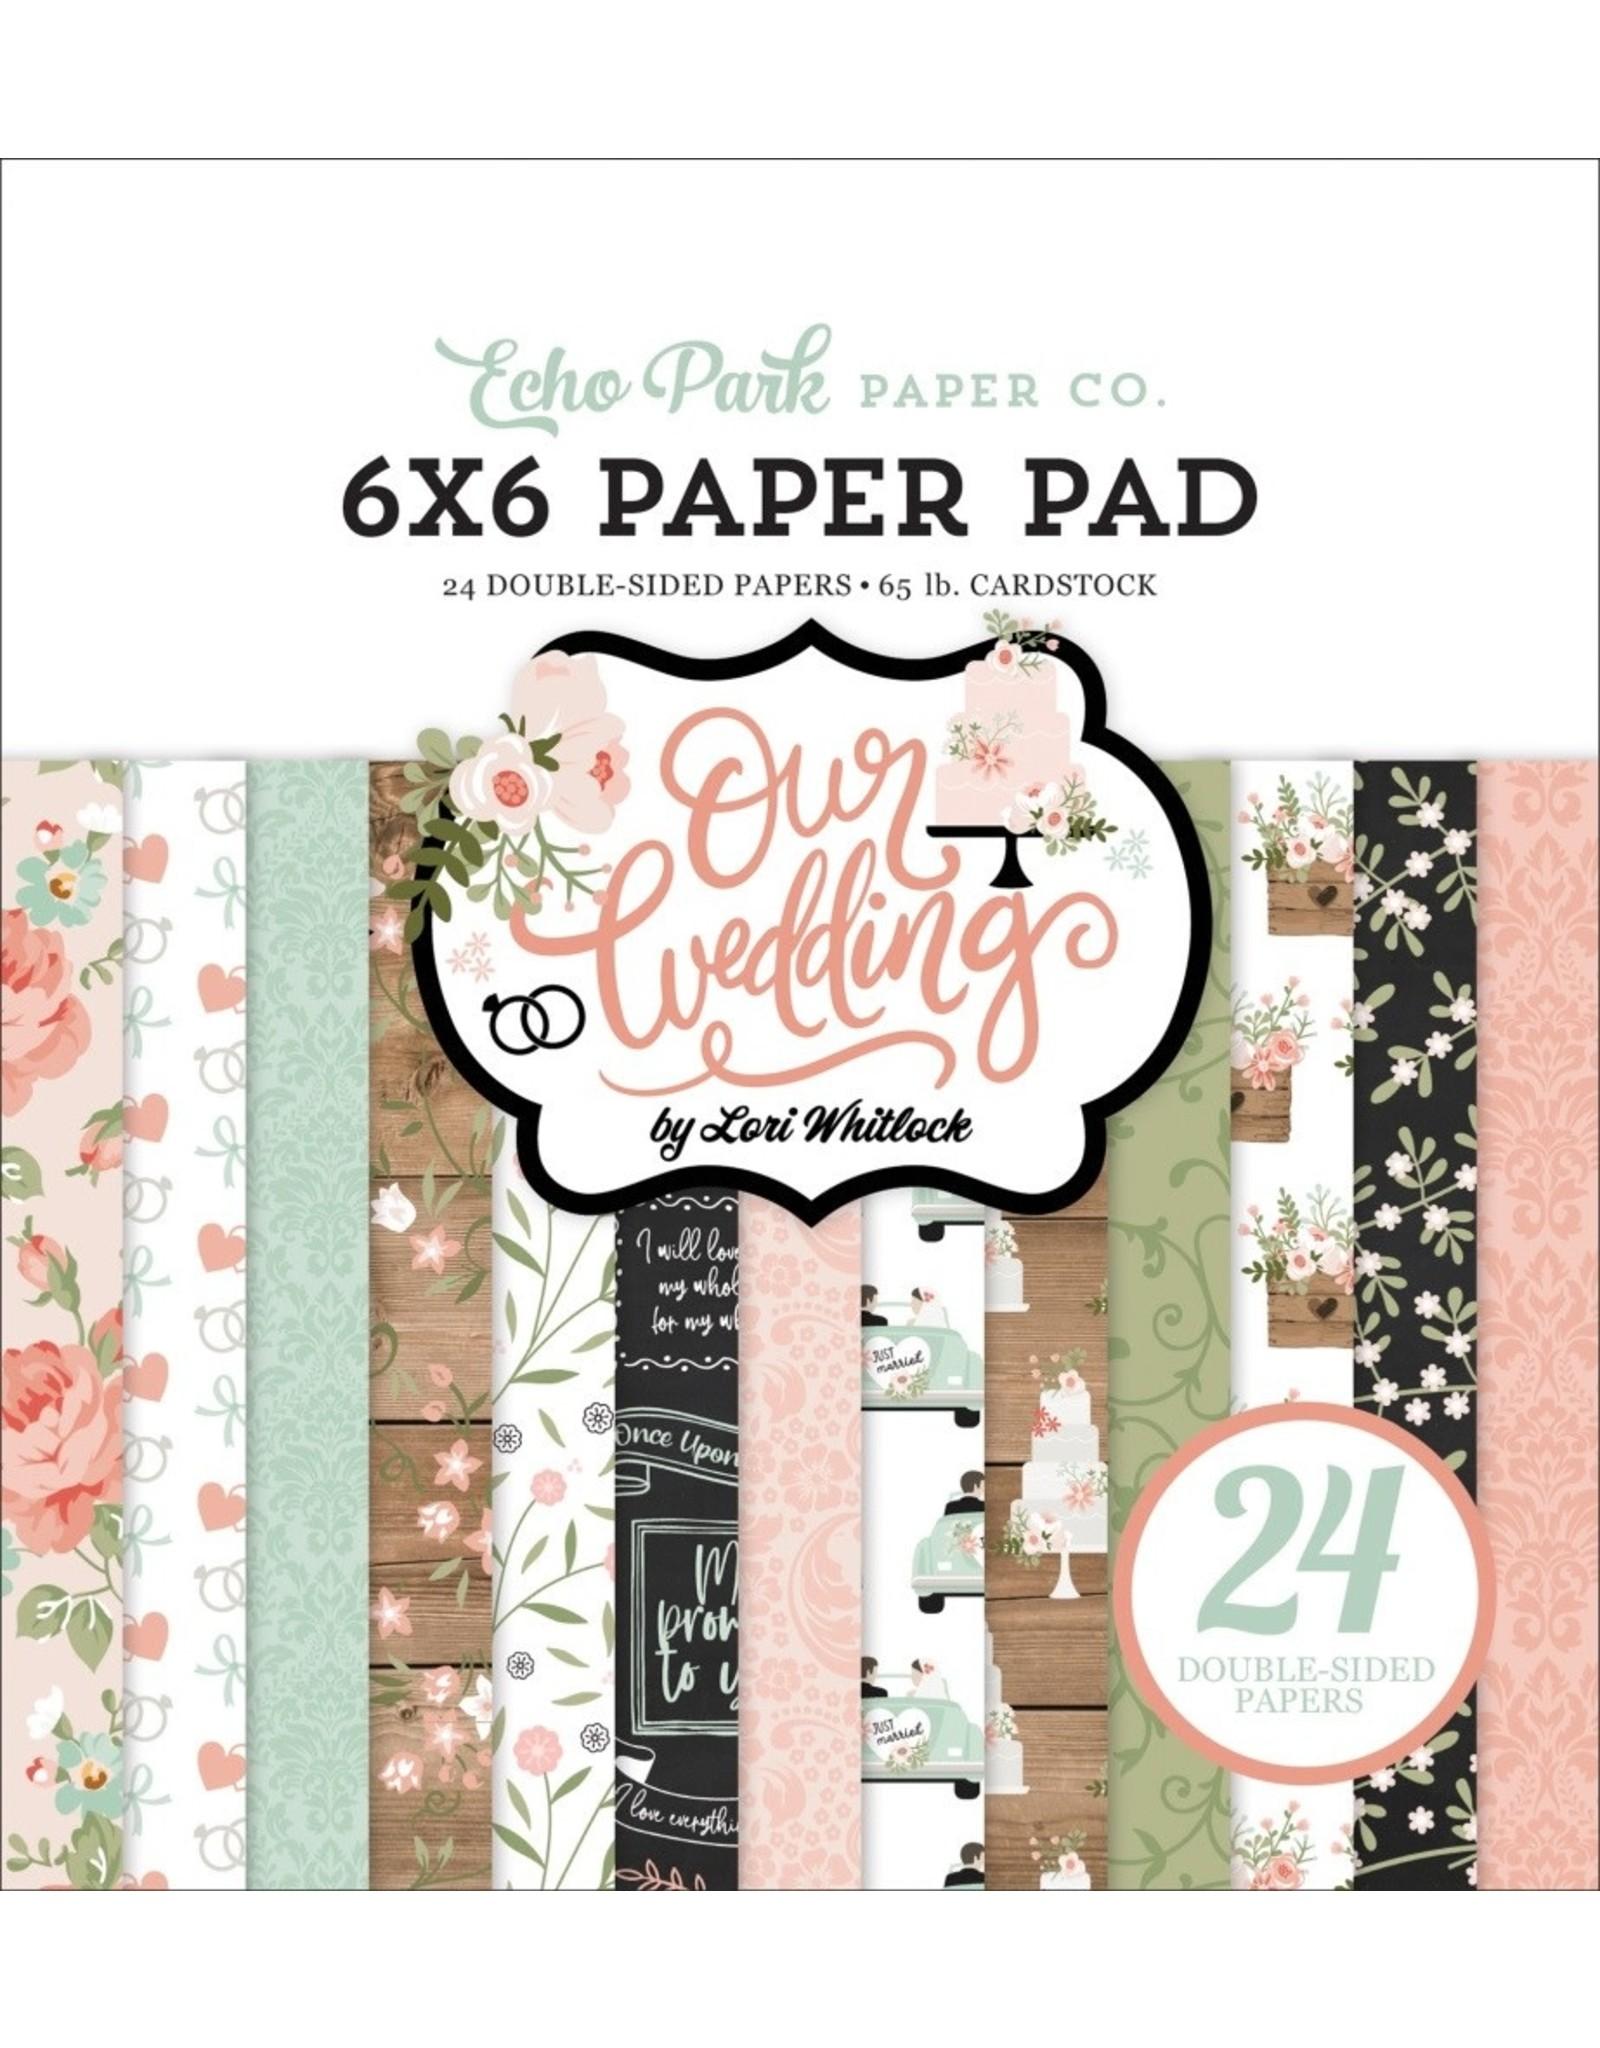 Echo Park 6X6 Paper Pad, Our Wedding